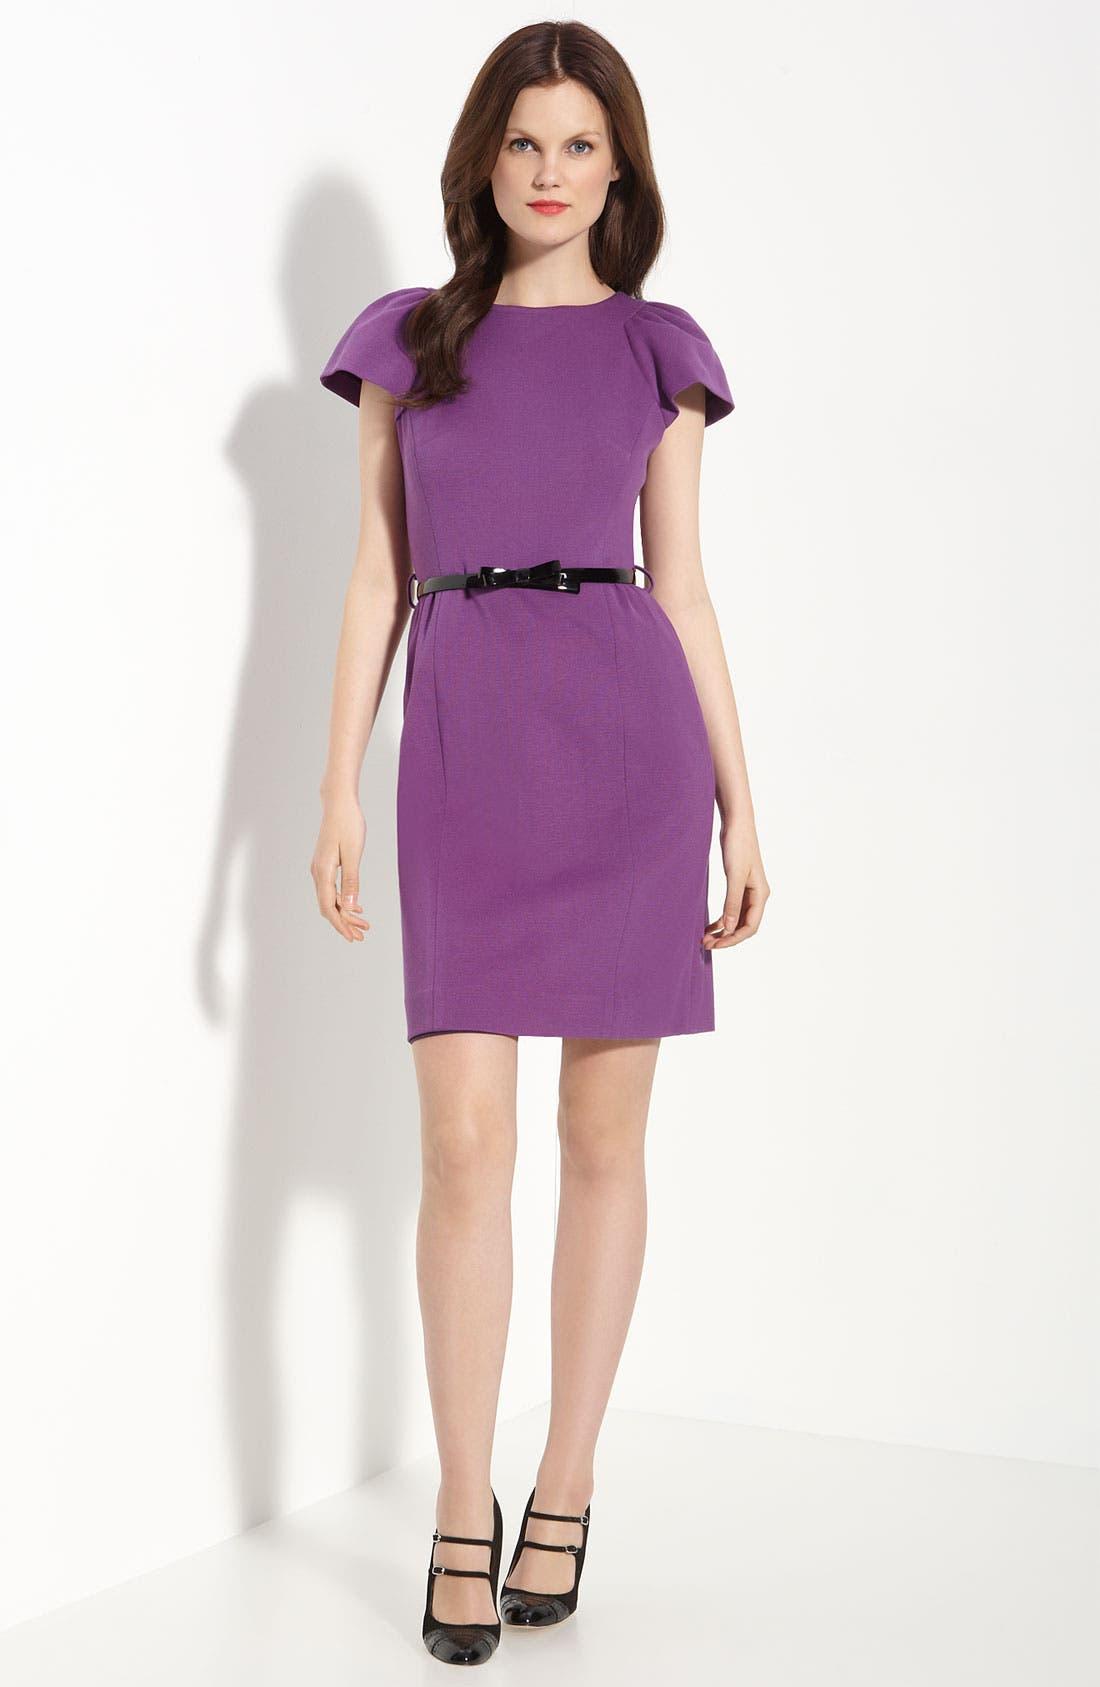 Alternate Image 1 Selected - Milly 'Addison' Ponte Knit Dress